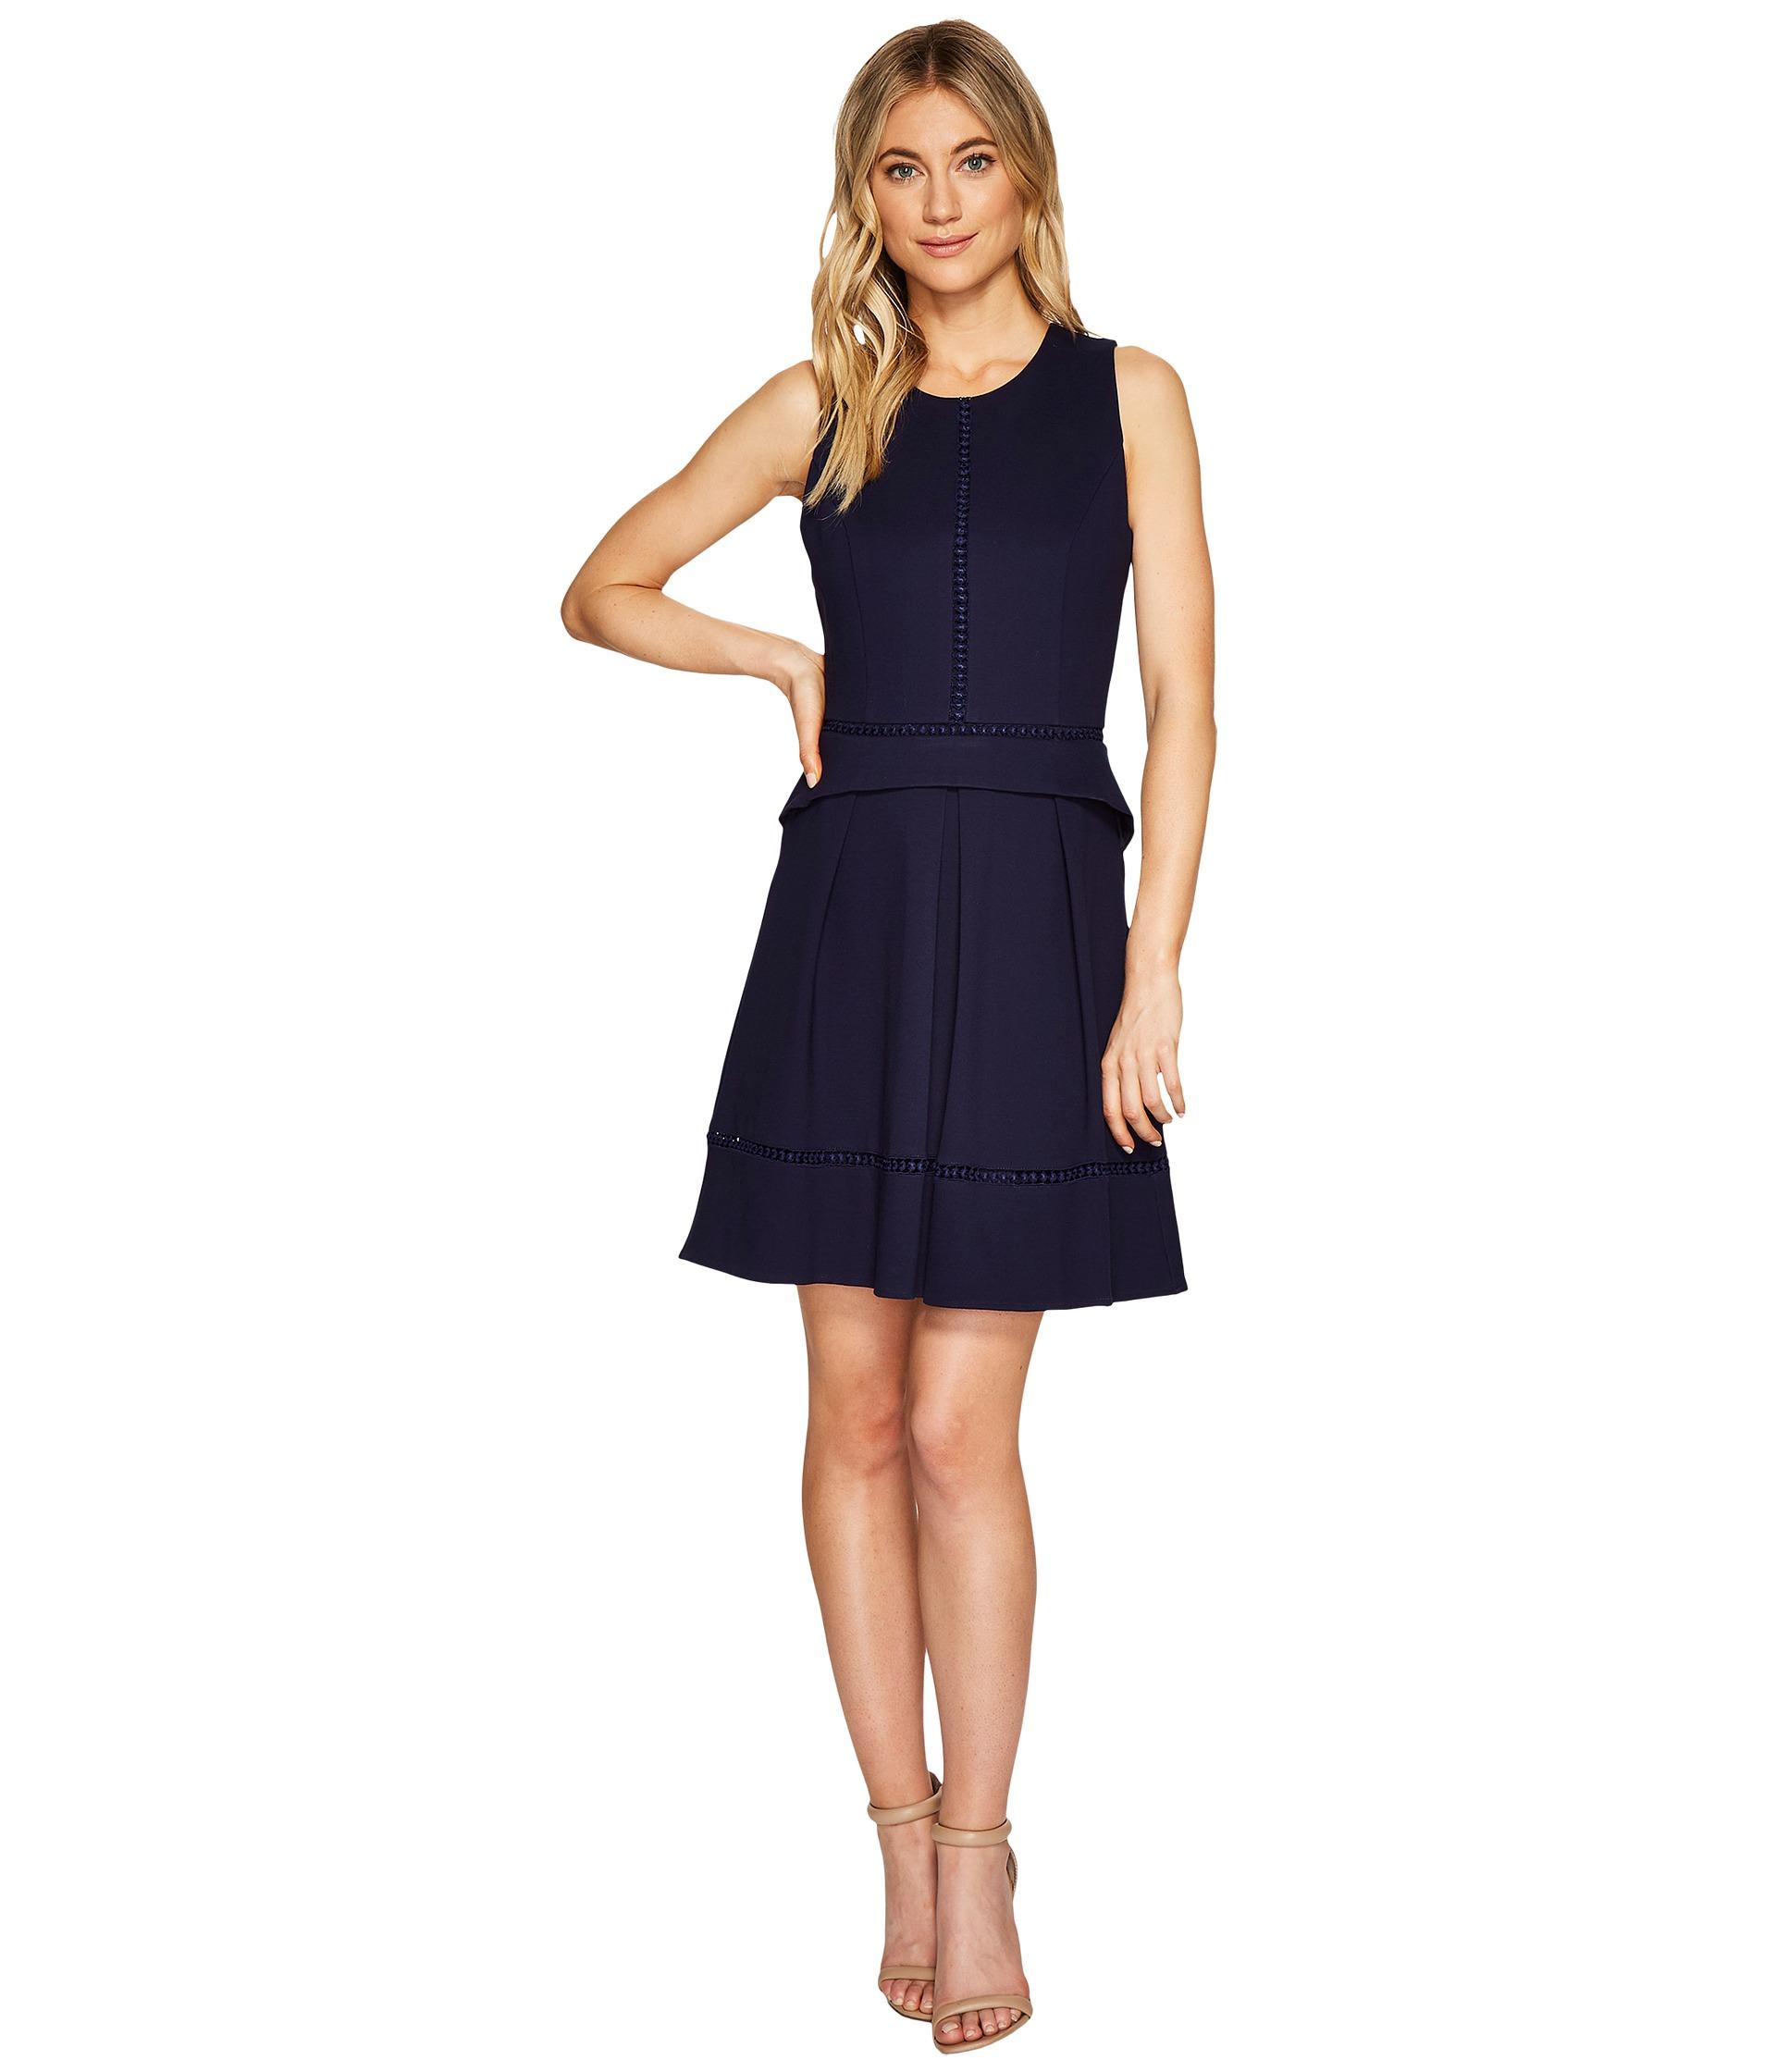 Adelyn Rae Hadyn Fit Amp Flare Dress At Zappos Com